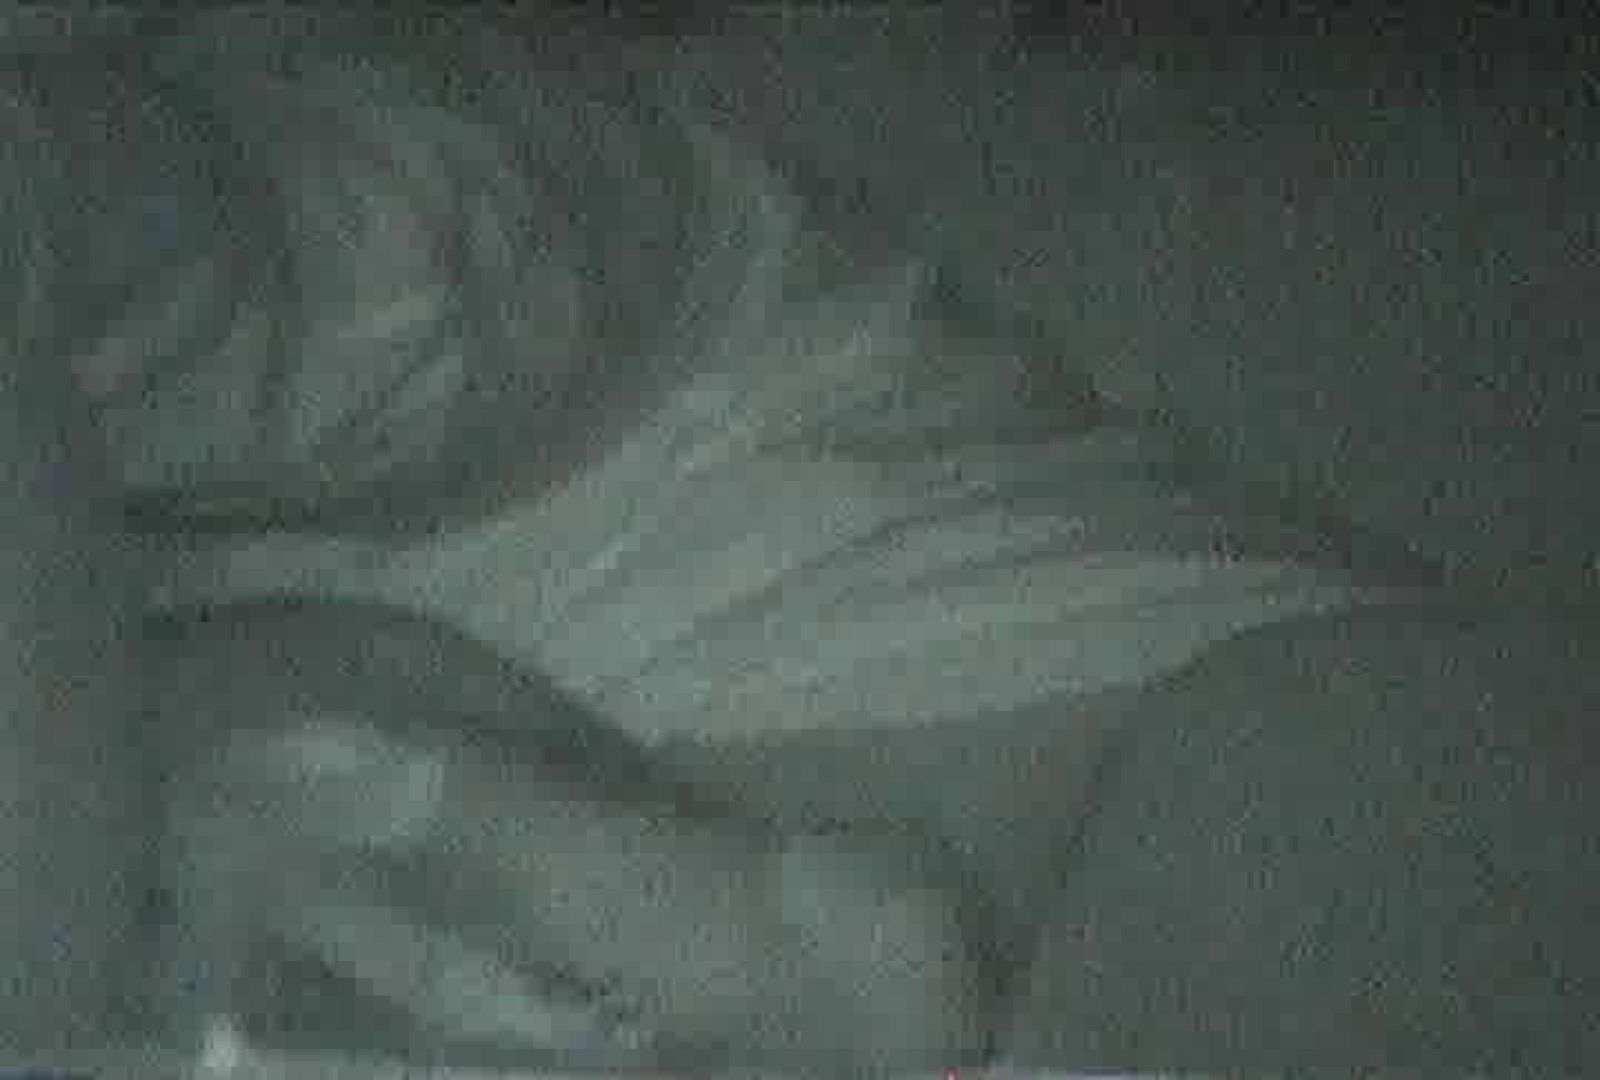 充血監督の深夜の運動会Vol.86 接写 セックス無修正動画無料 98画像 95